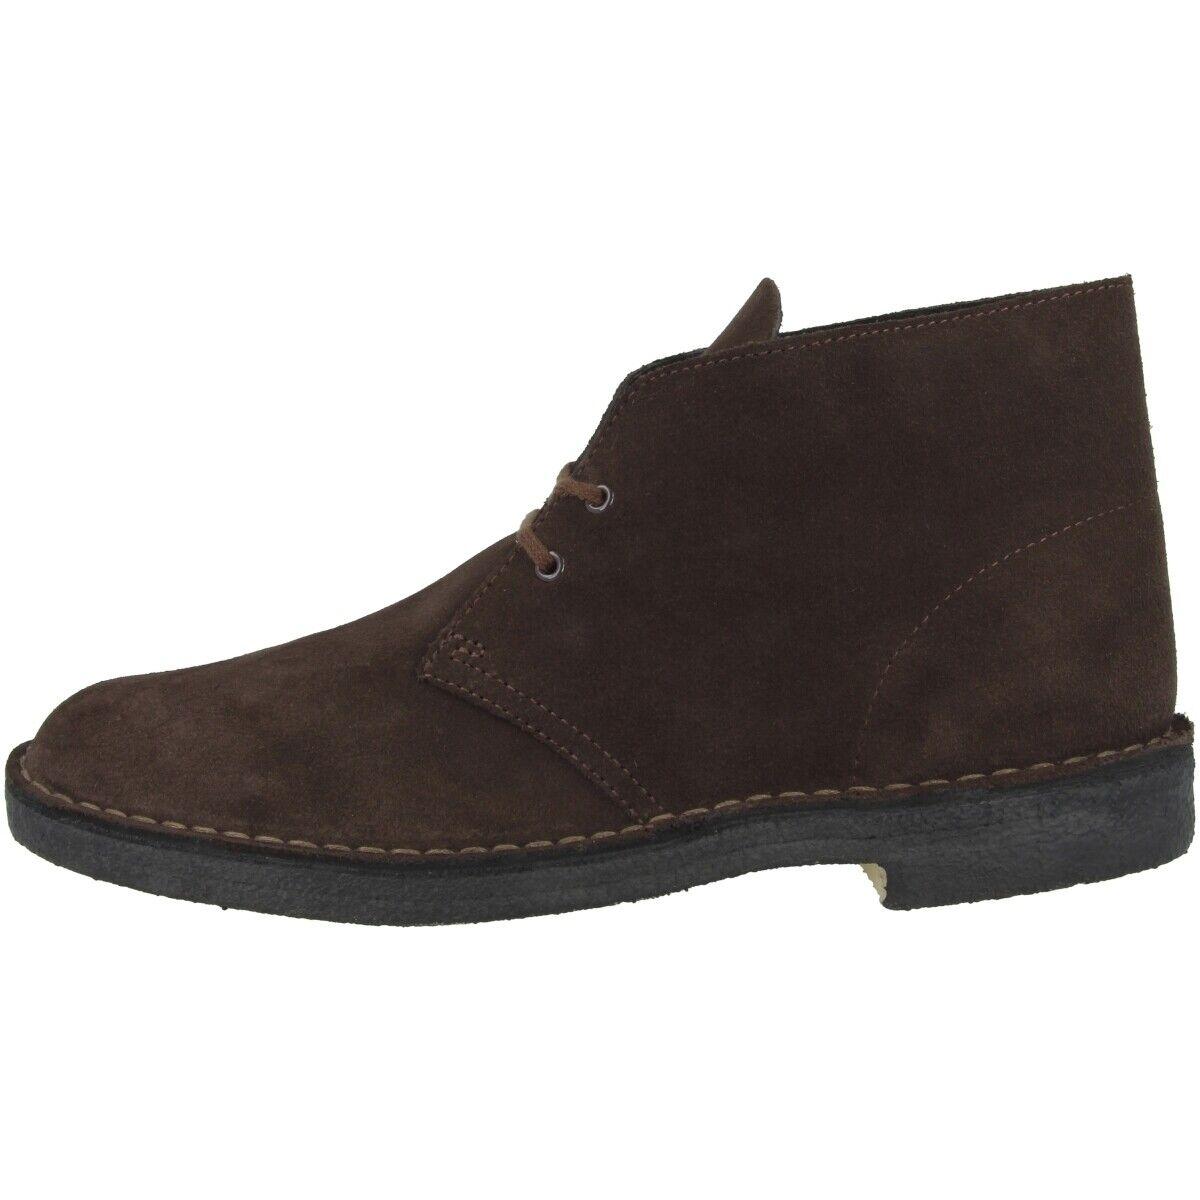 Schuhe BY9697 Laufschuhe Herren Packung Nmd_R2 Original